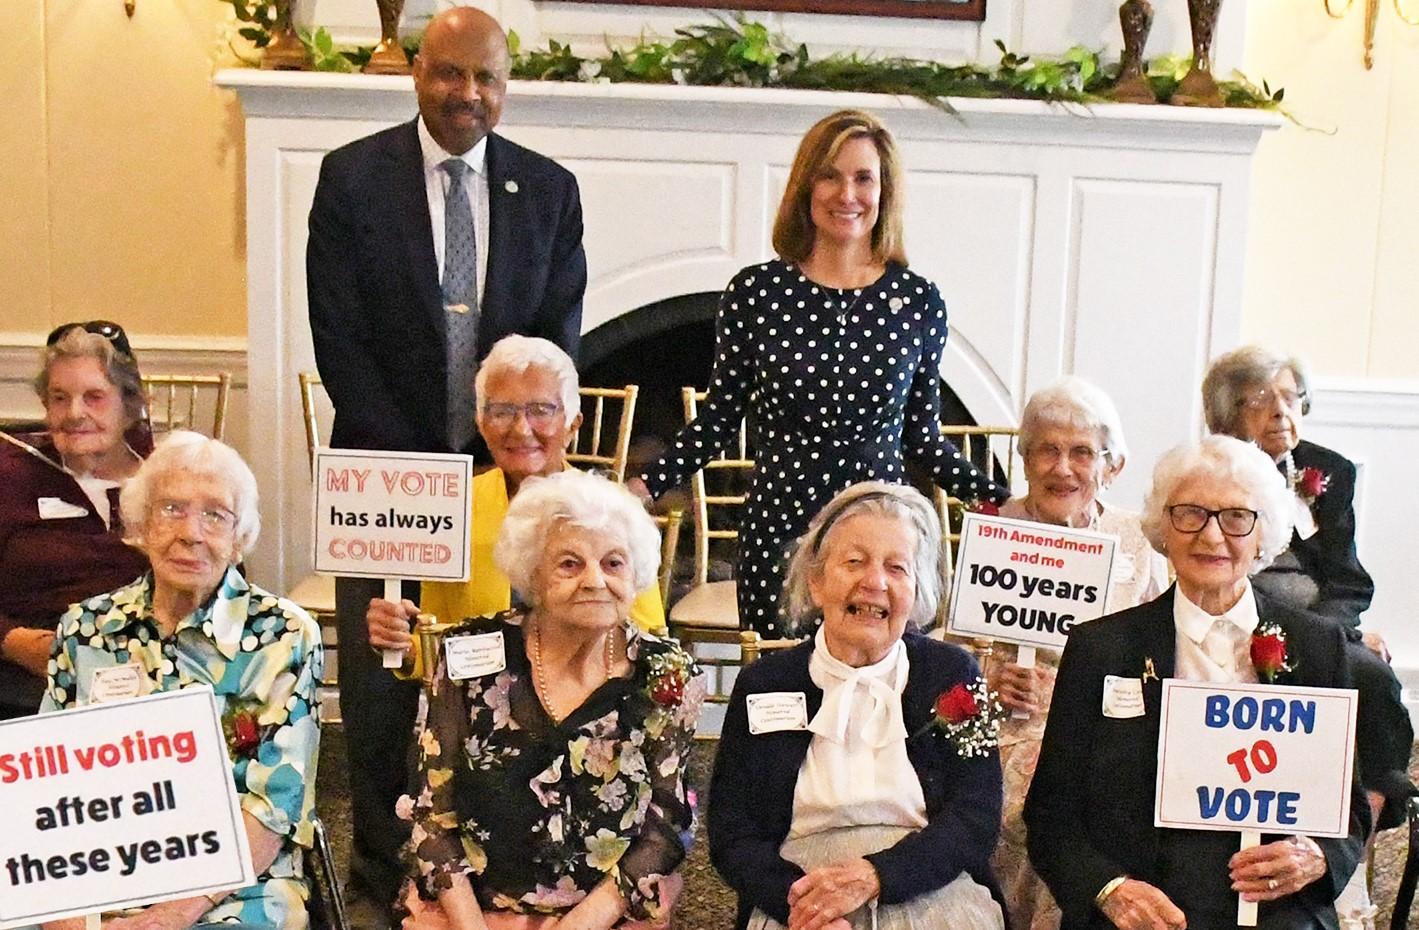 Chester County Recognizes 100th Anniversary of 19th Amendment in Pennsylvania